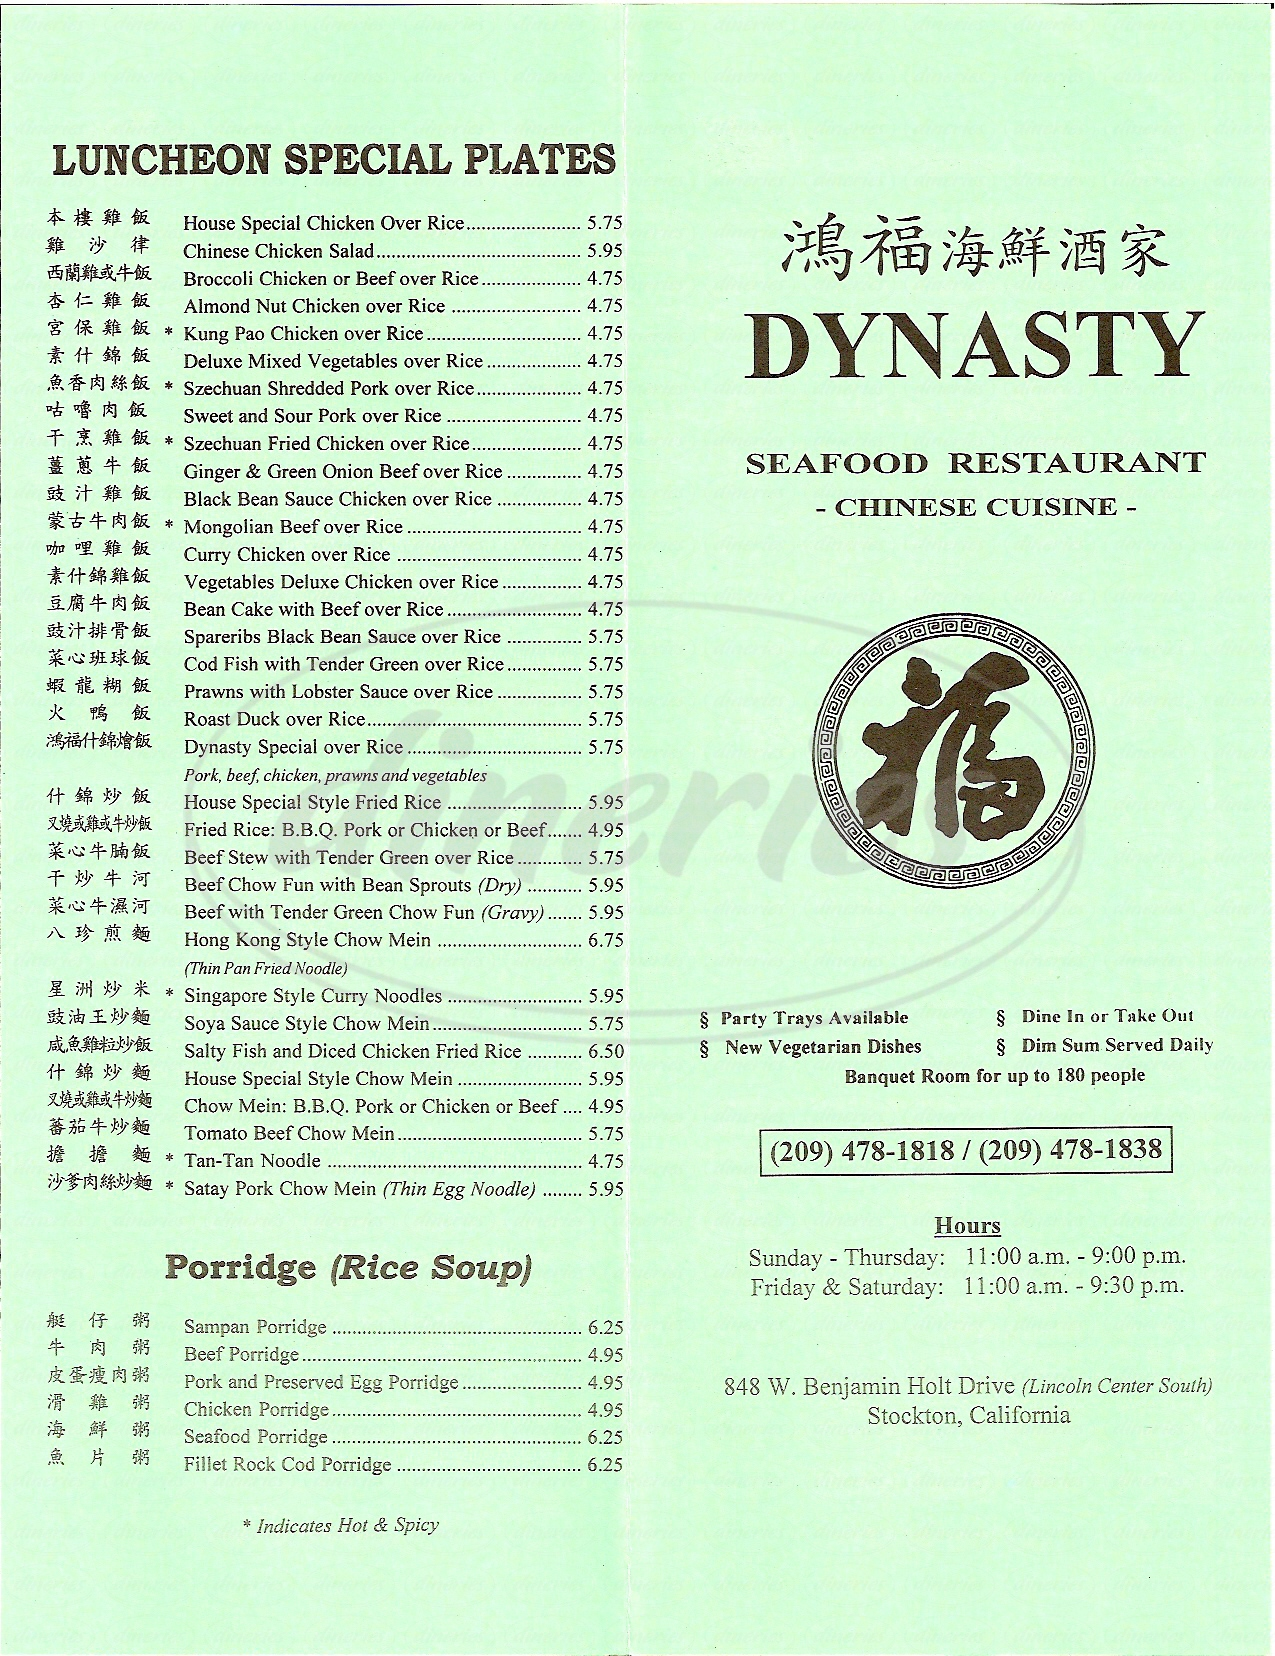 Dynasty Restaurant Stockton Ca Menu